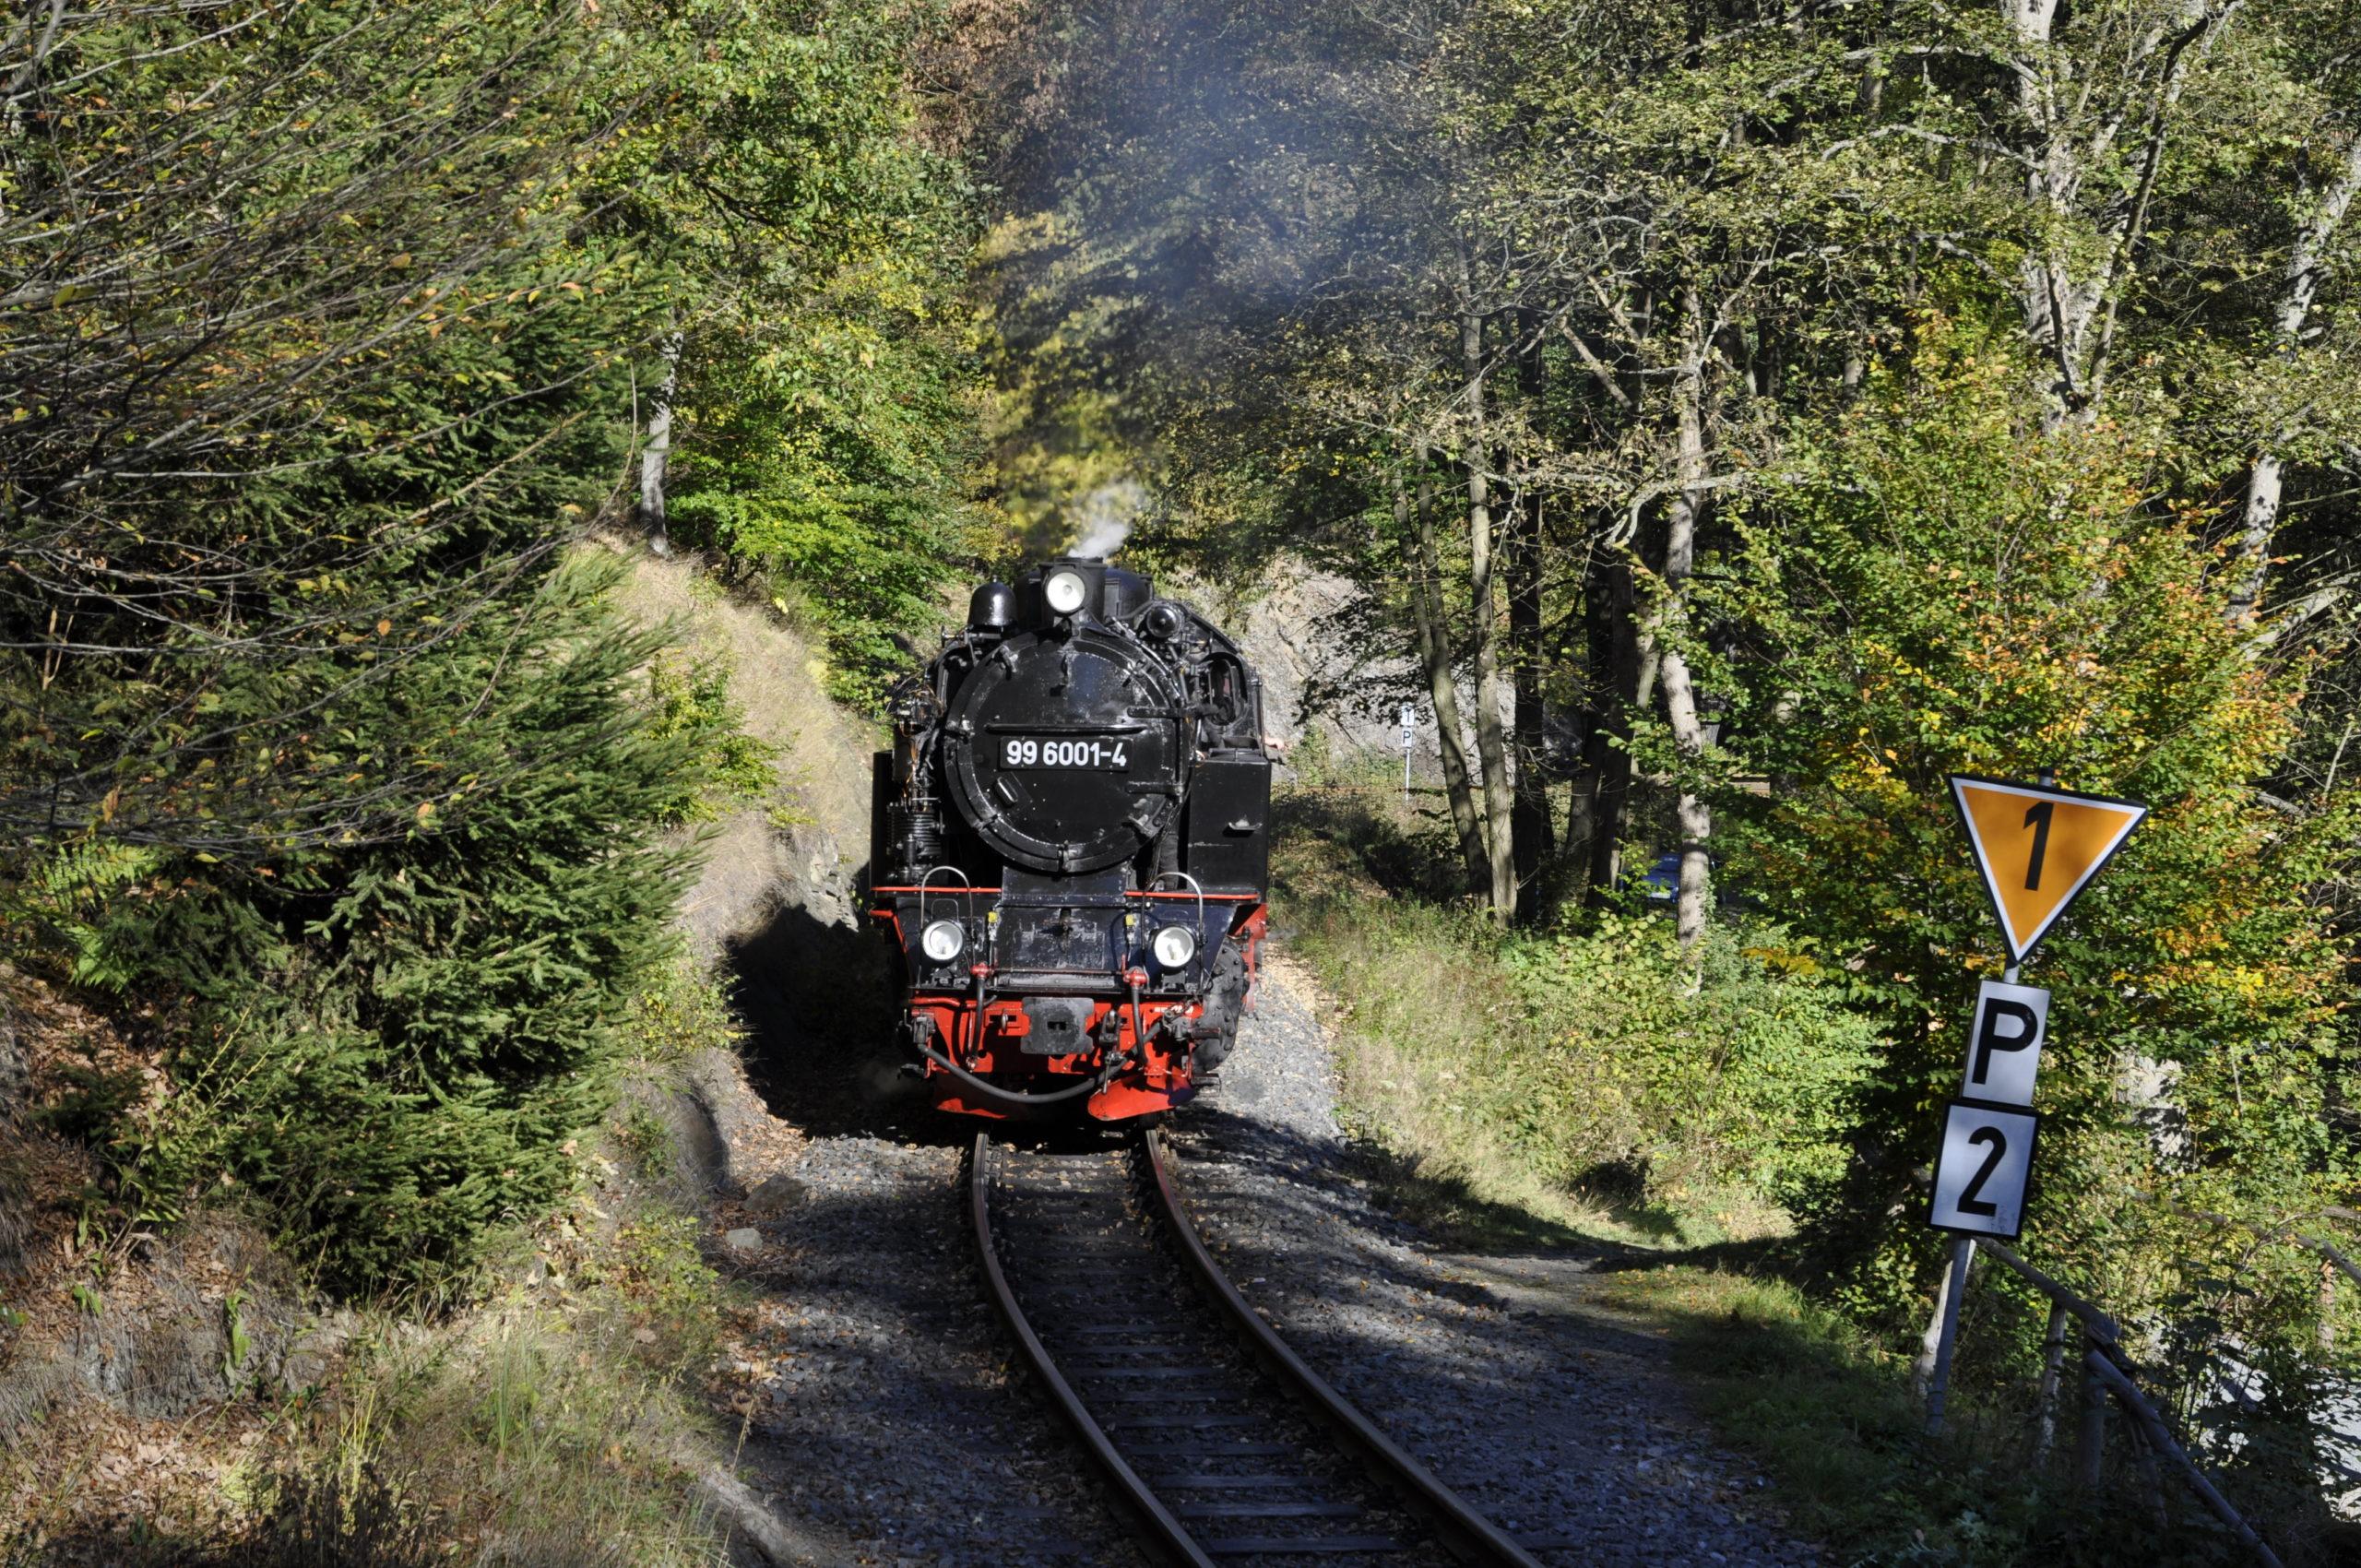 Nahe des Haltepunkts Drahtzug am 16.10.2011 (c) Joachim Volkhardt